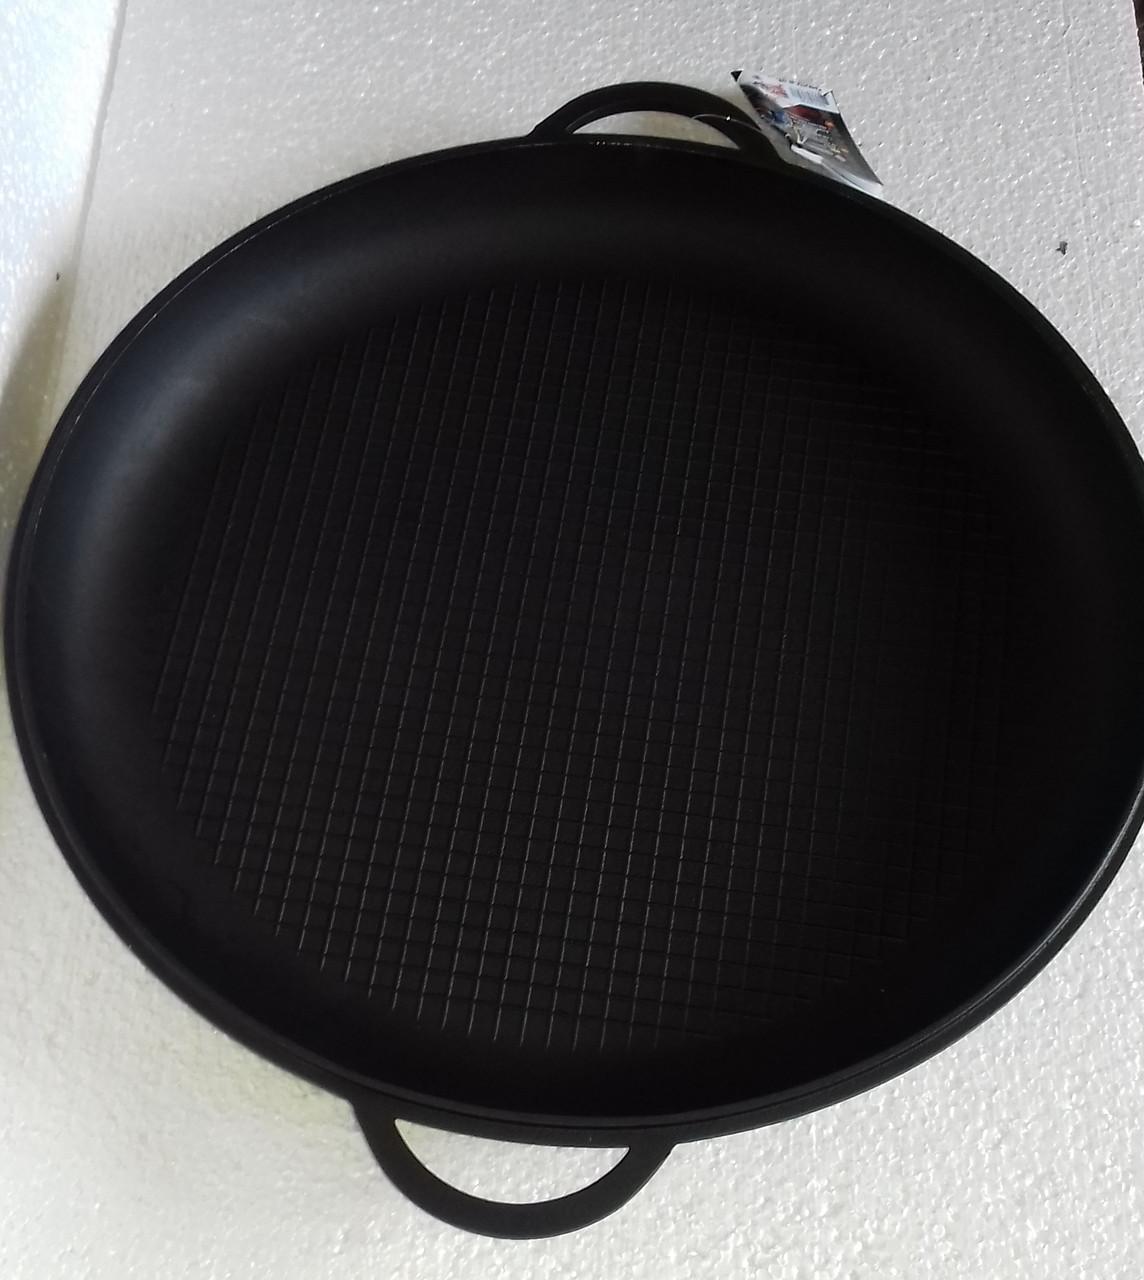 Крышка-сковорода чугунная, ТМ Термо. Диаметр 340мм, рифленое дно